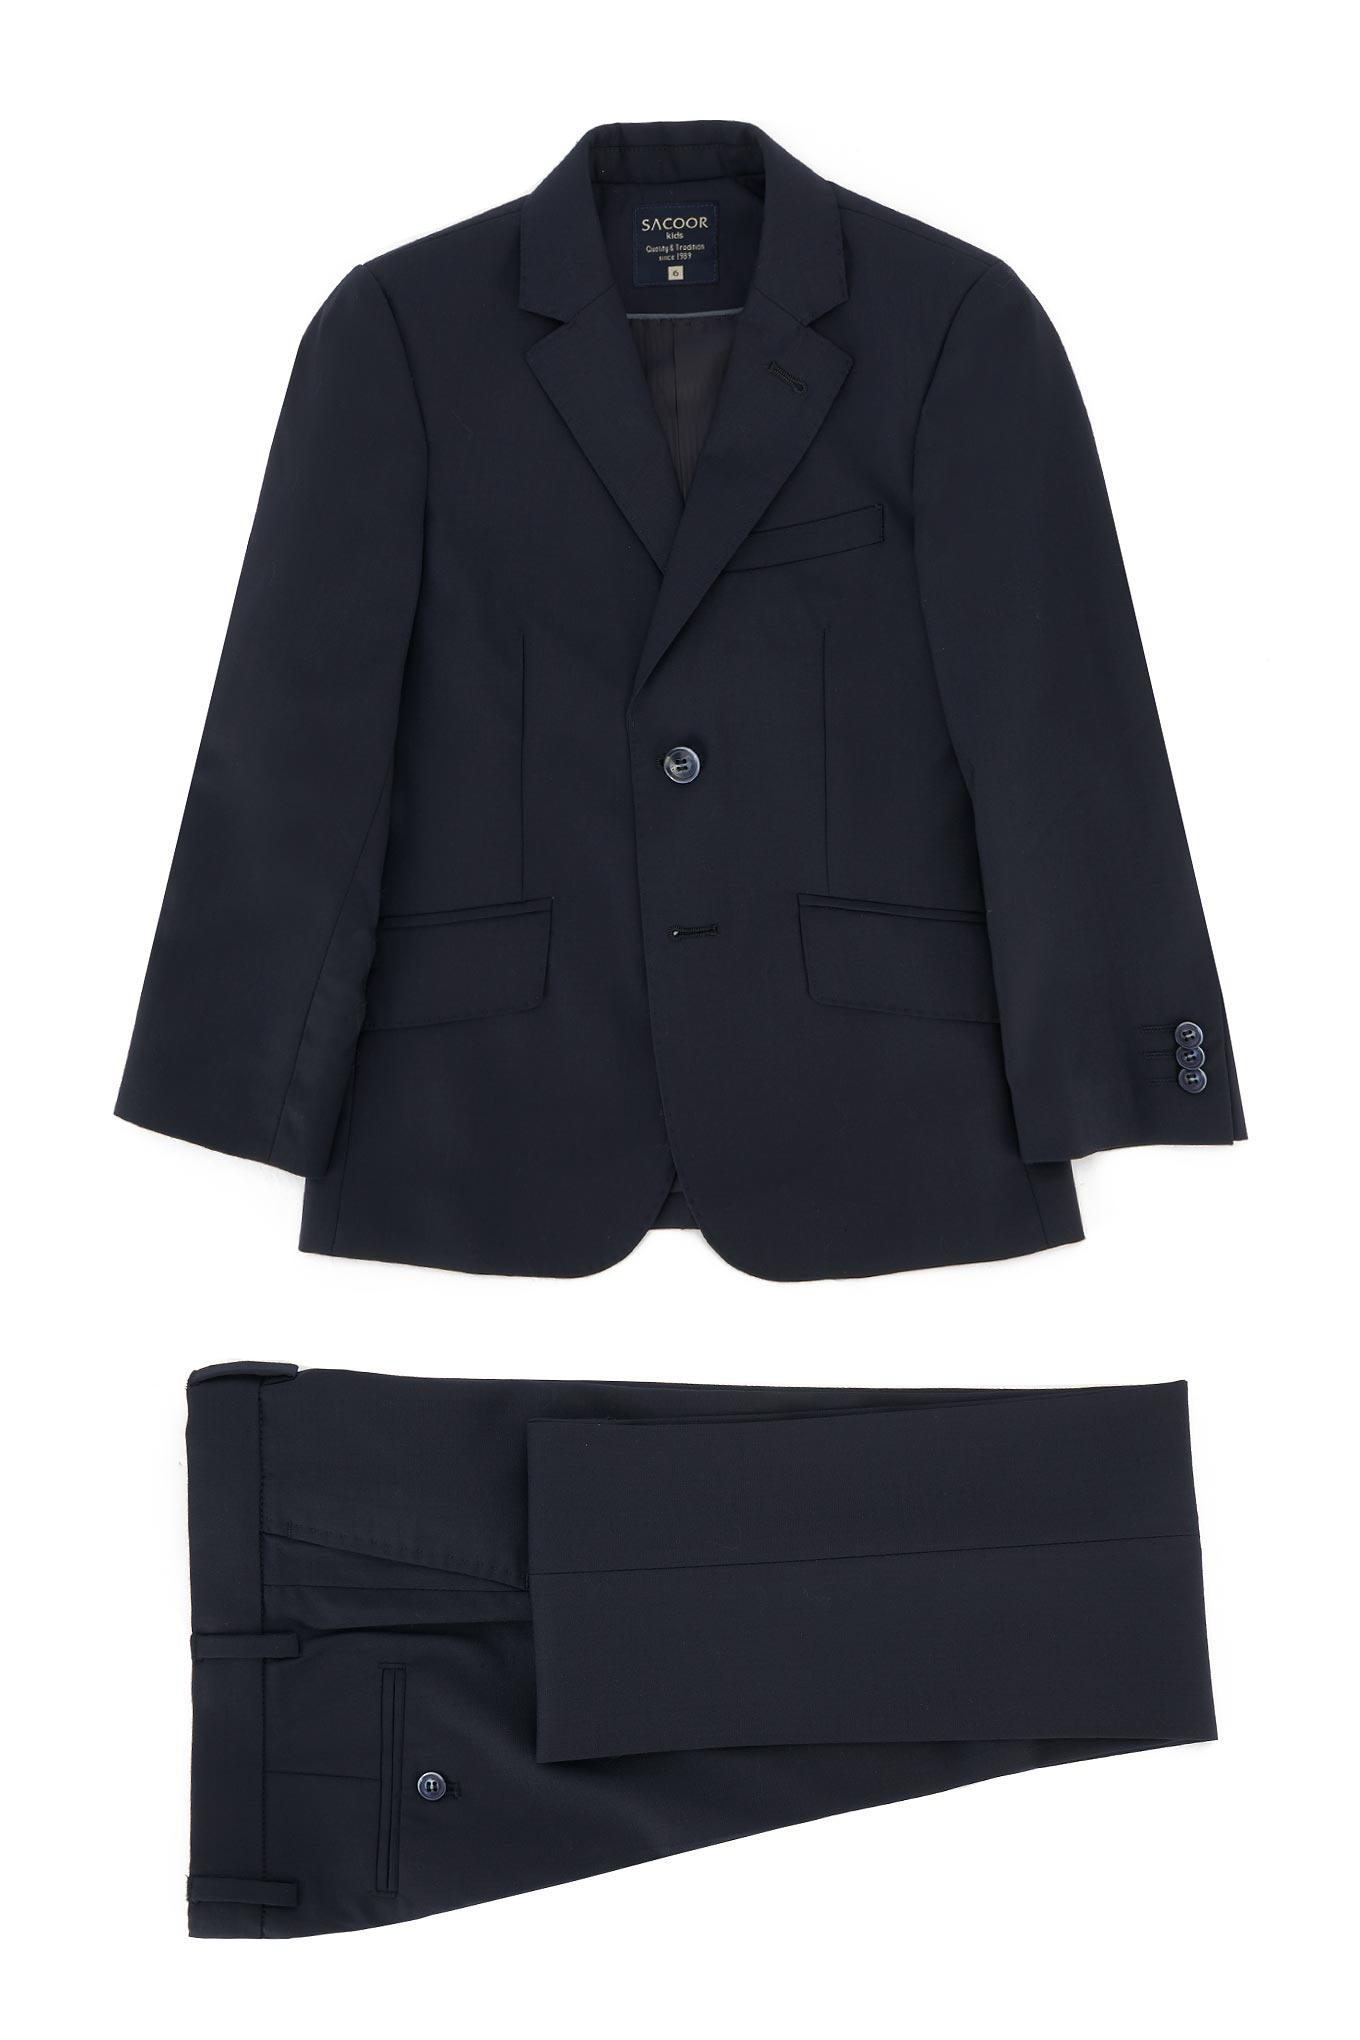 Suit Dark Blue Classic Boy